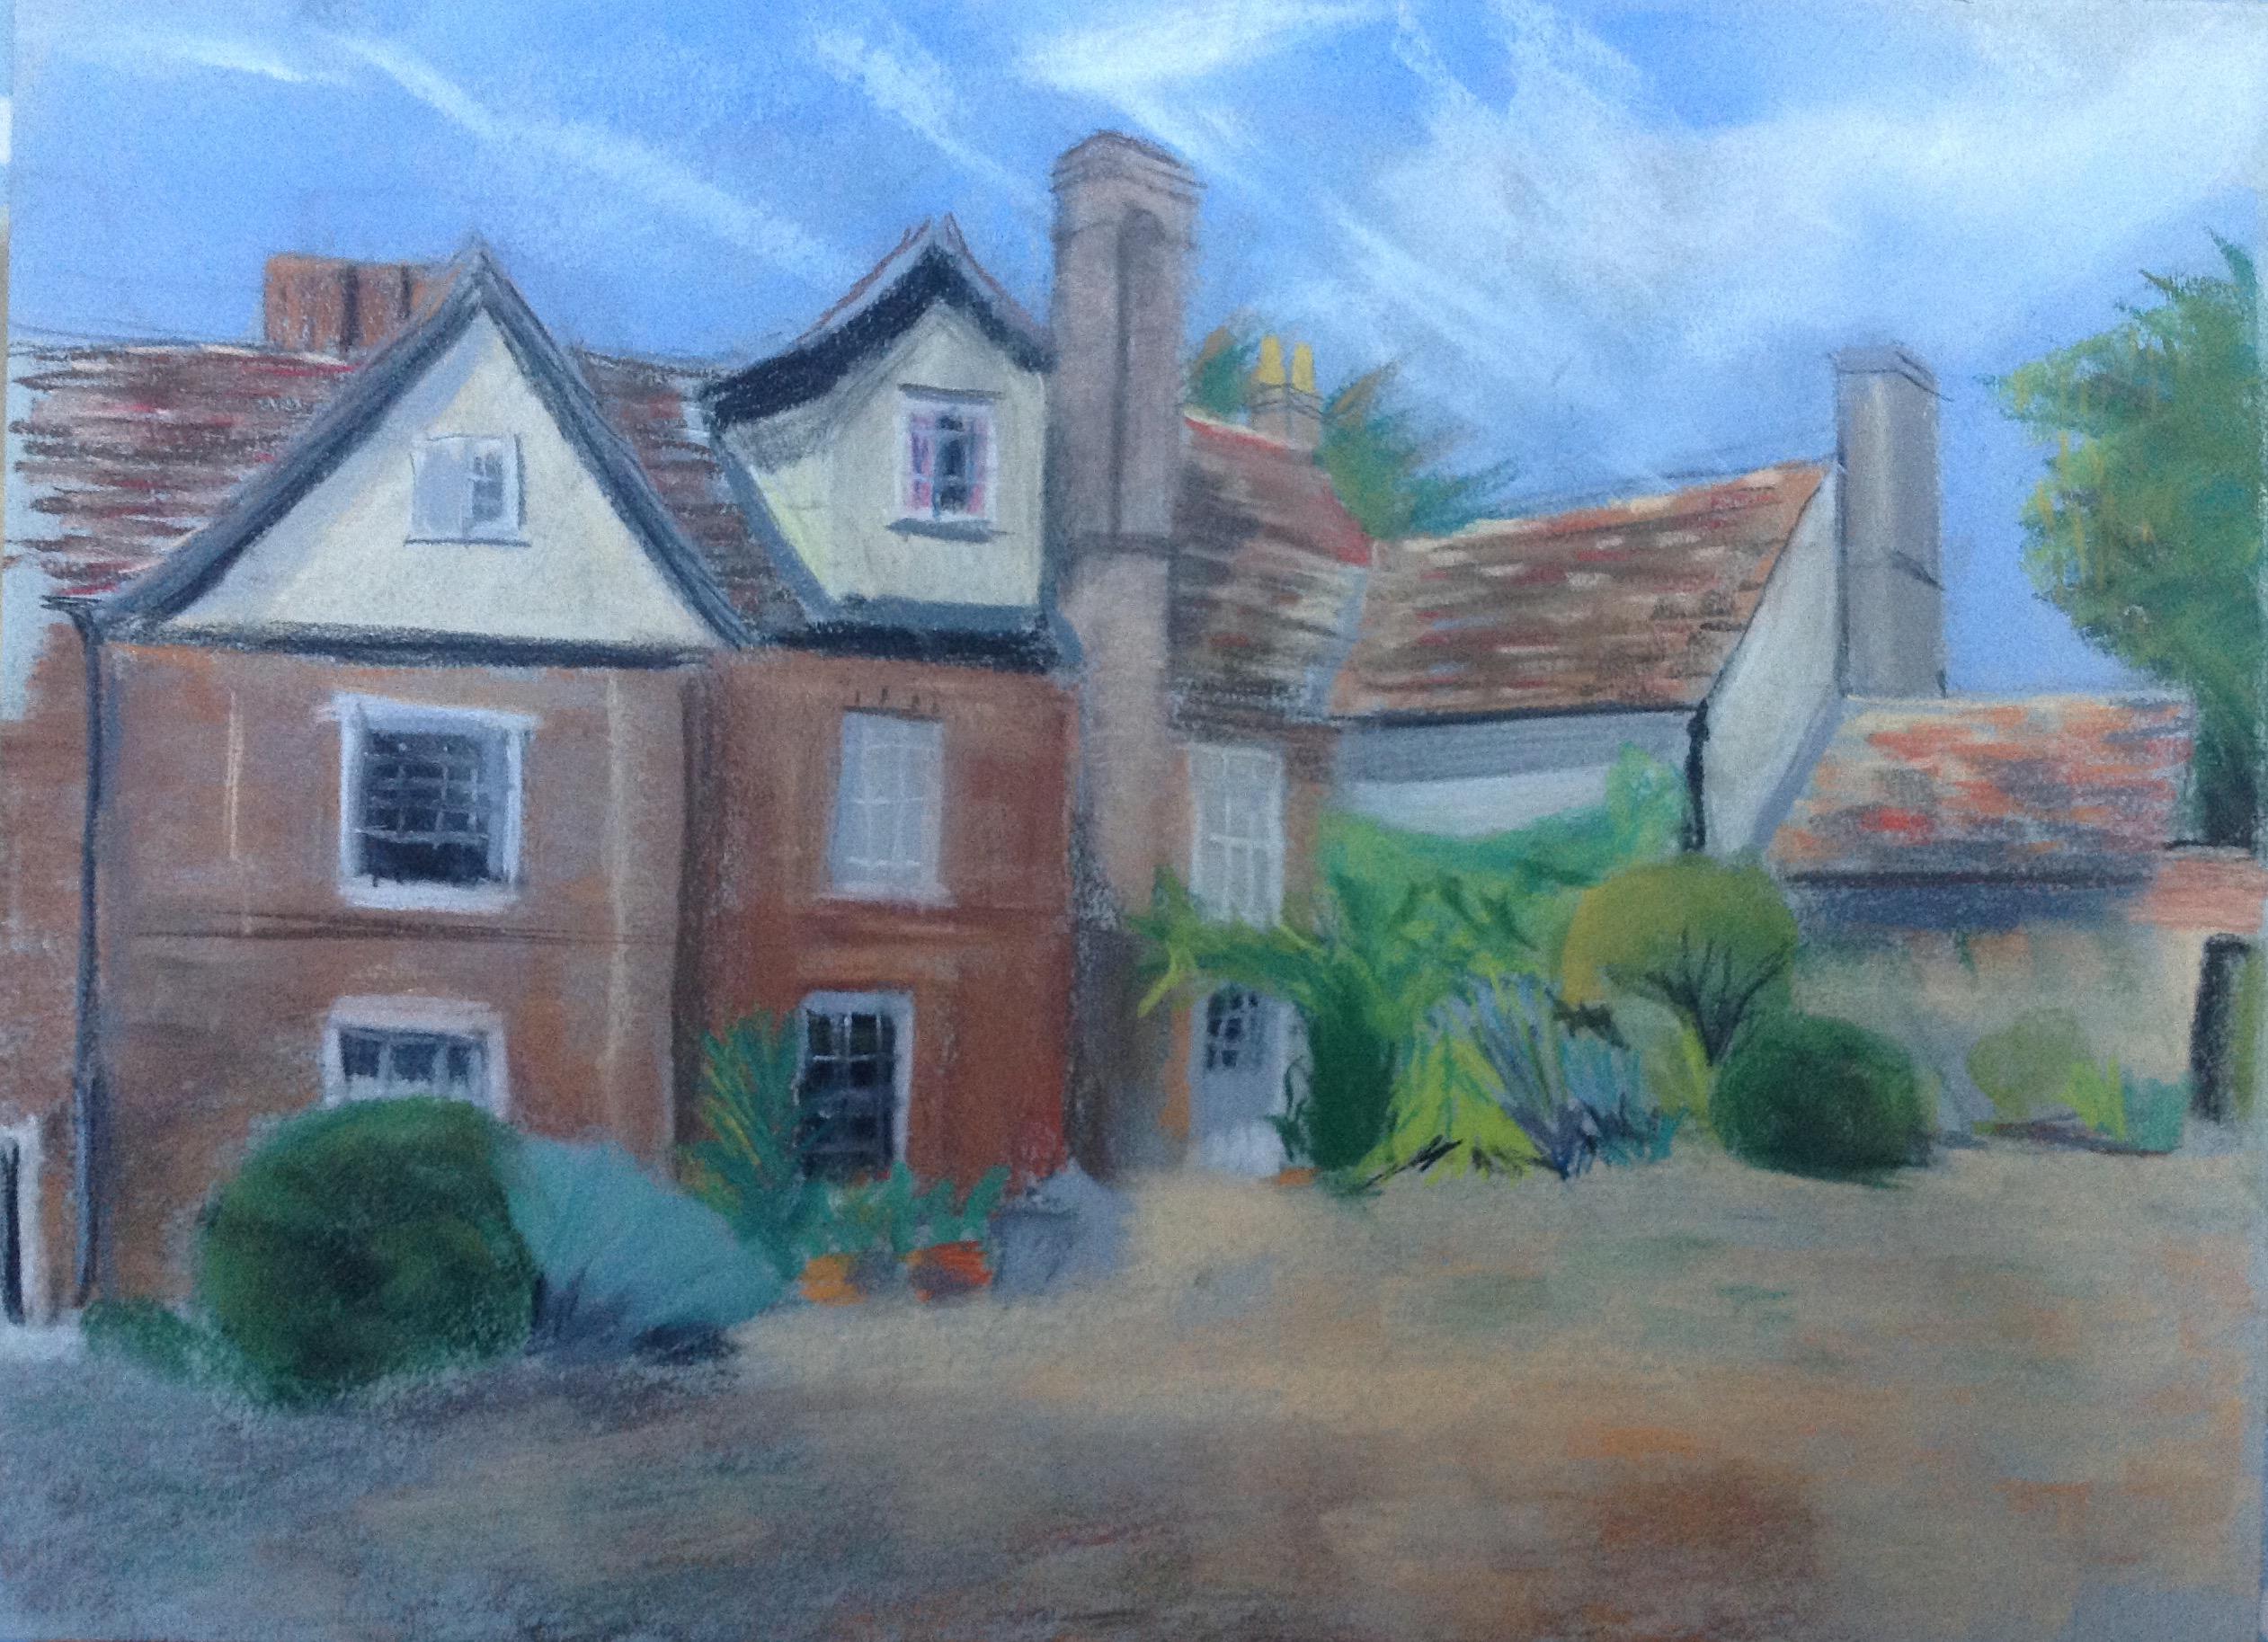 Abbey House